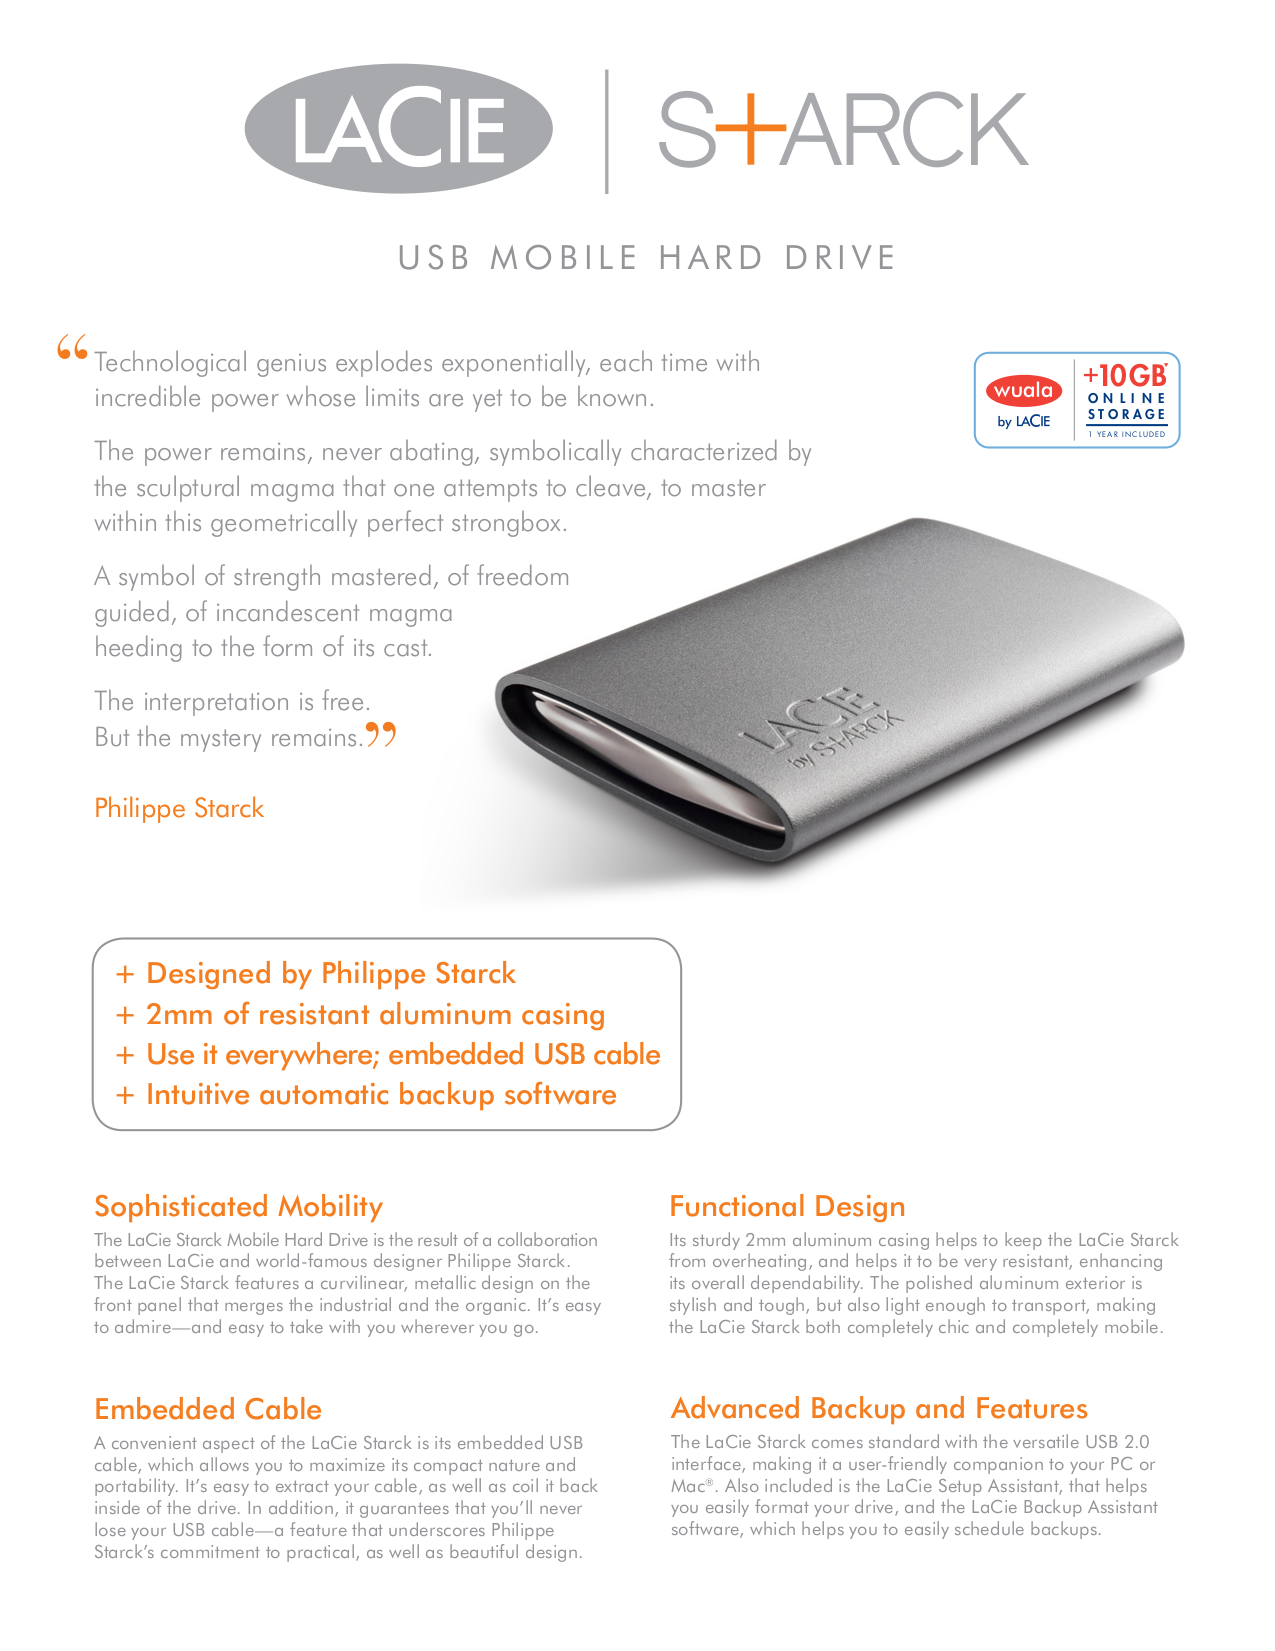 pdf for LaCie Storage 301891 manual